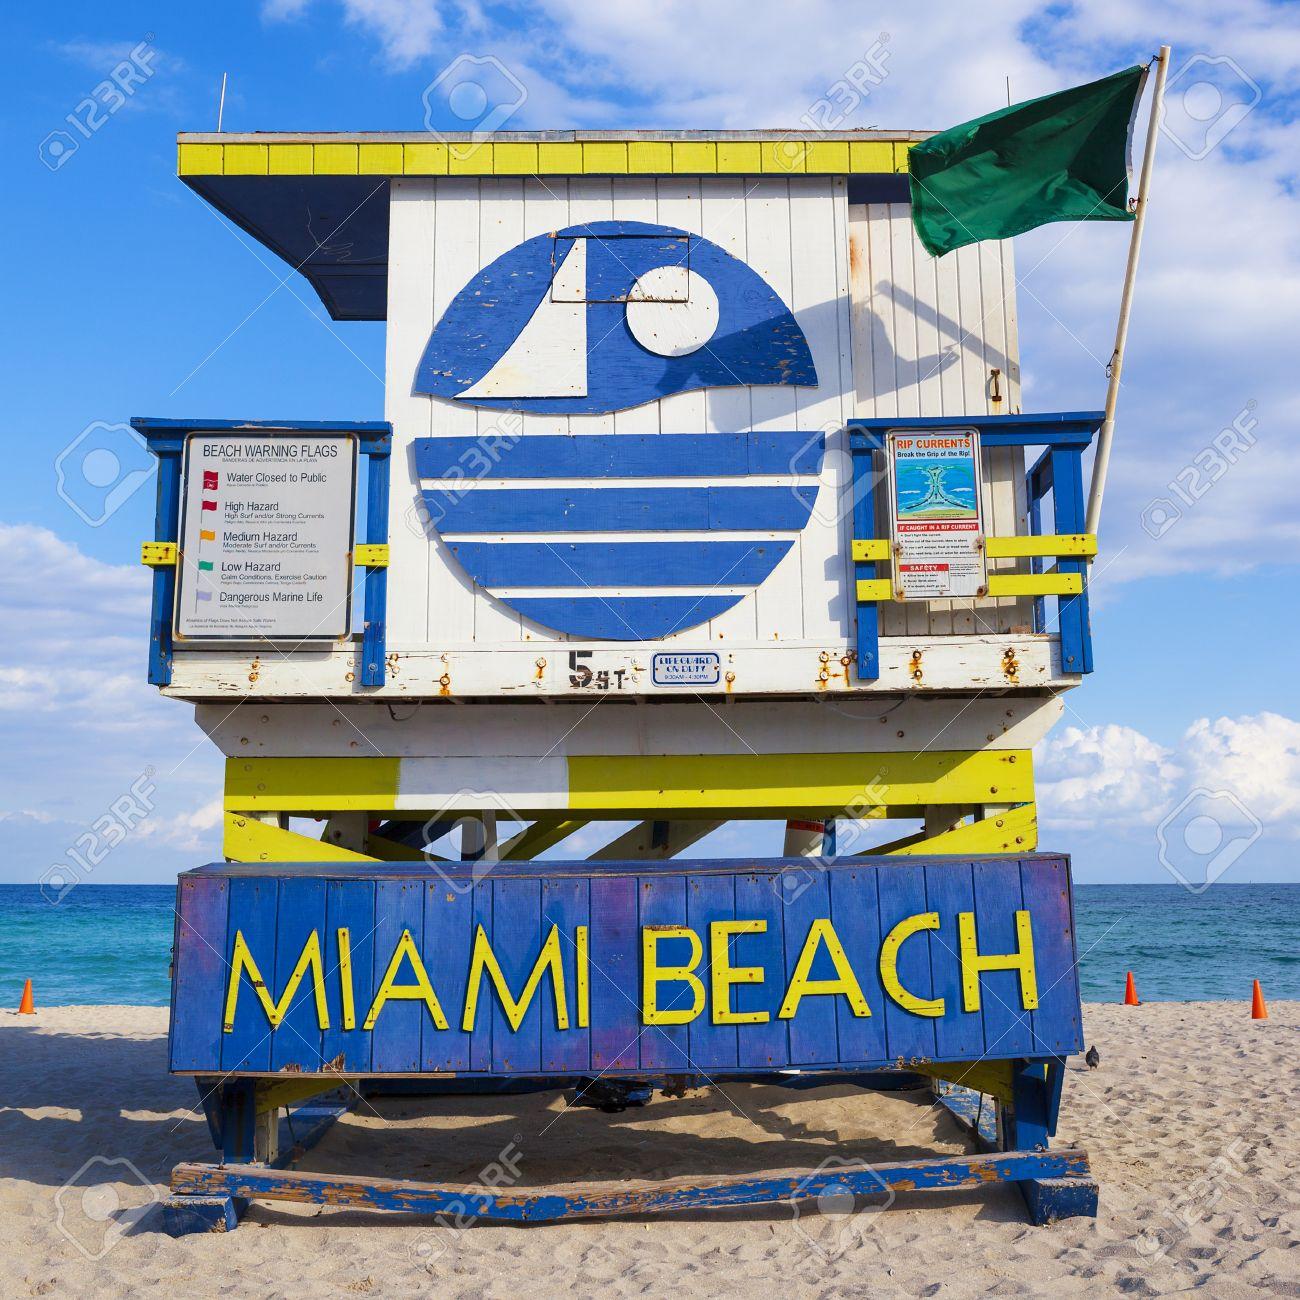 Miami Beach Florida, famous lifeguard house